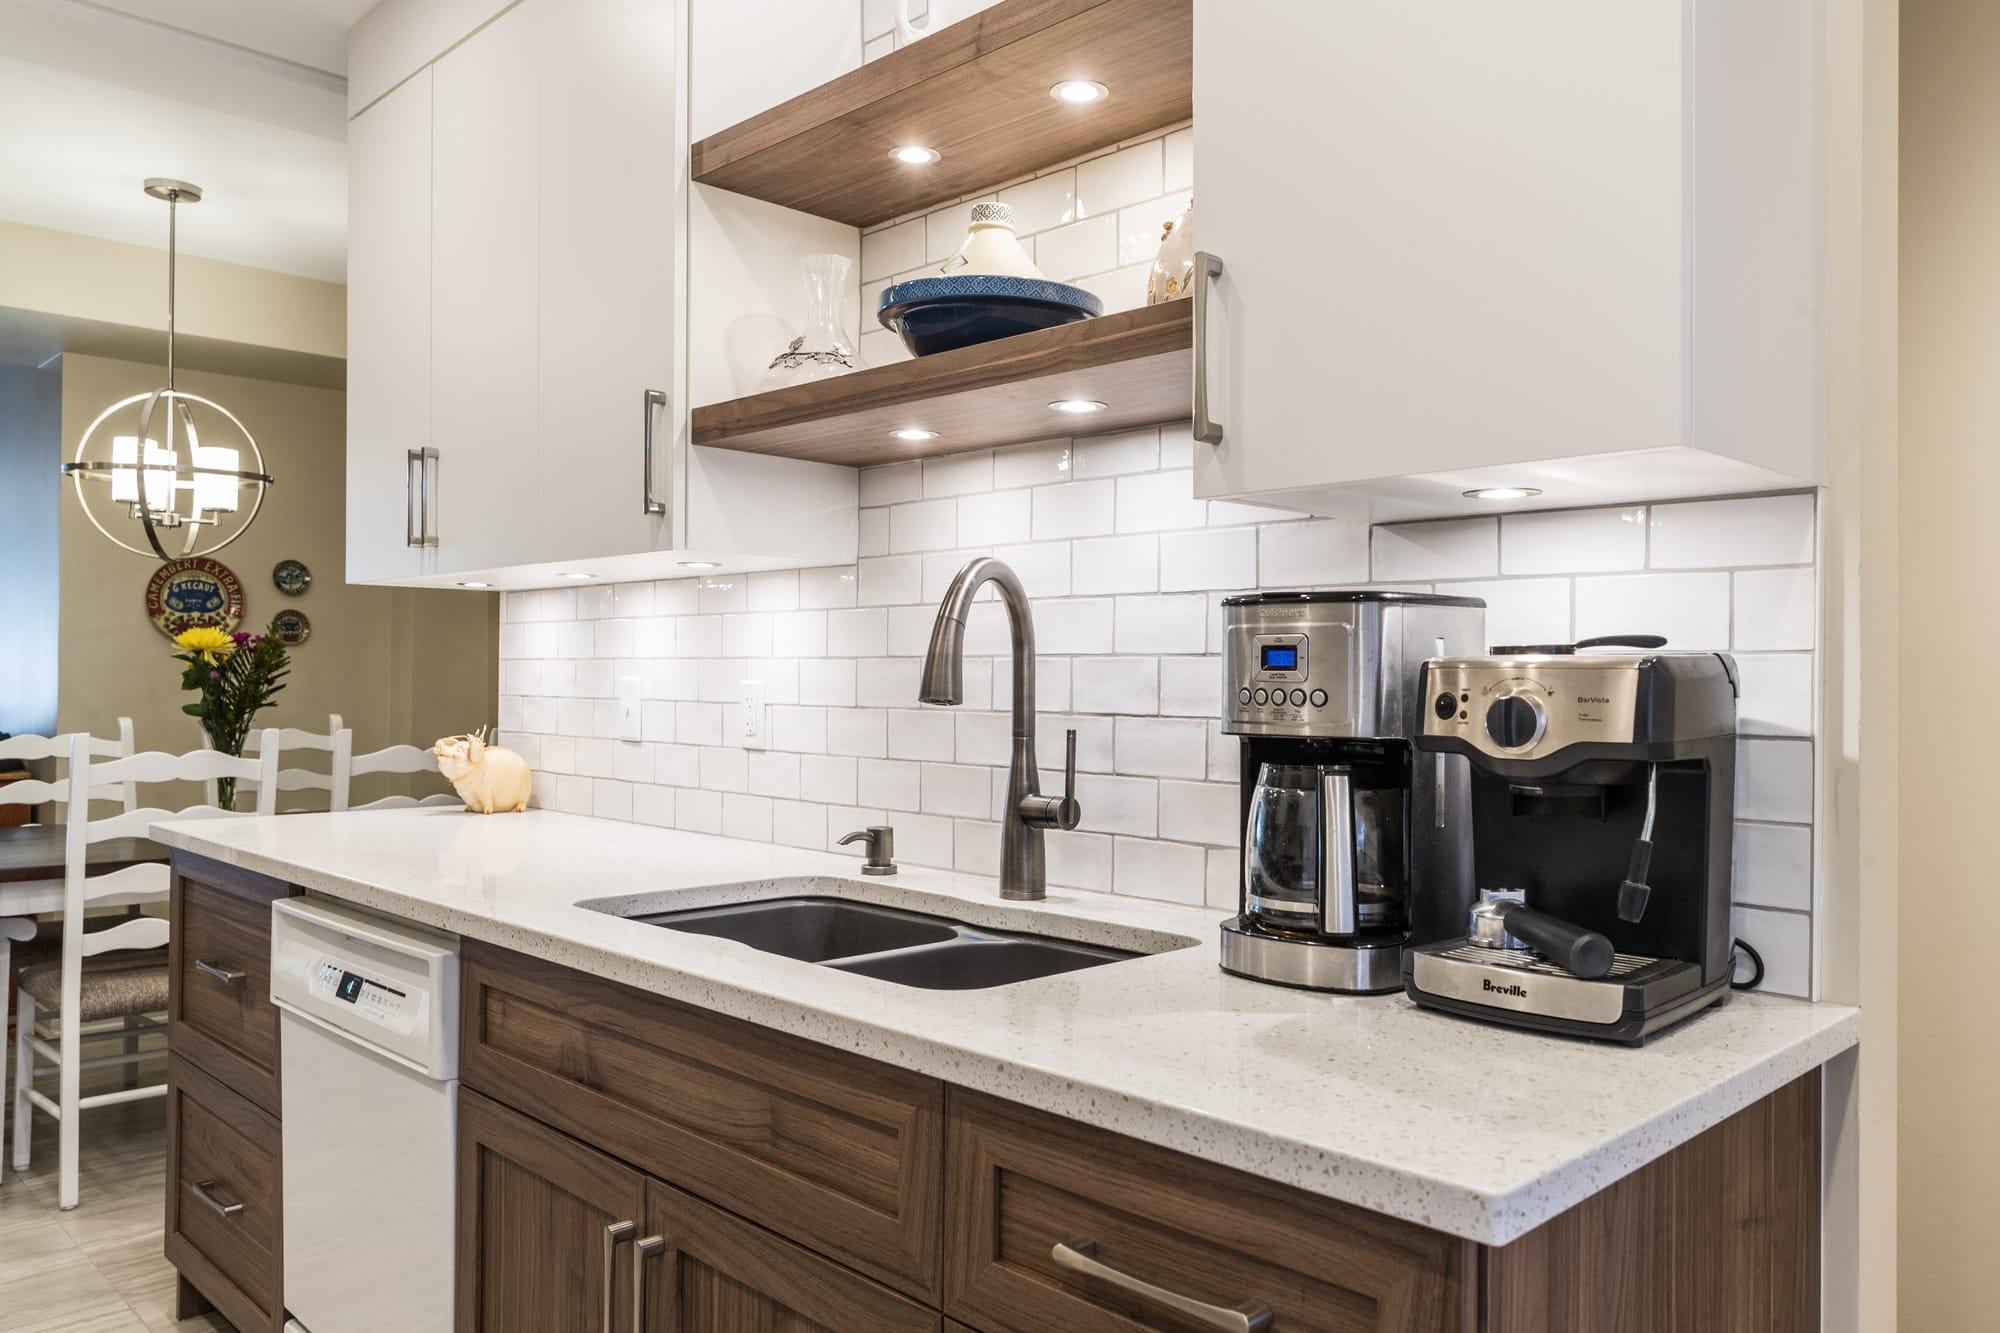 kitchen backsplash with two tone cabinets